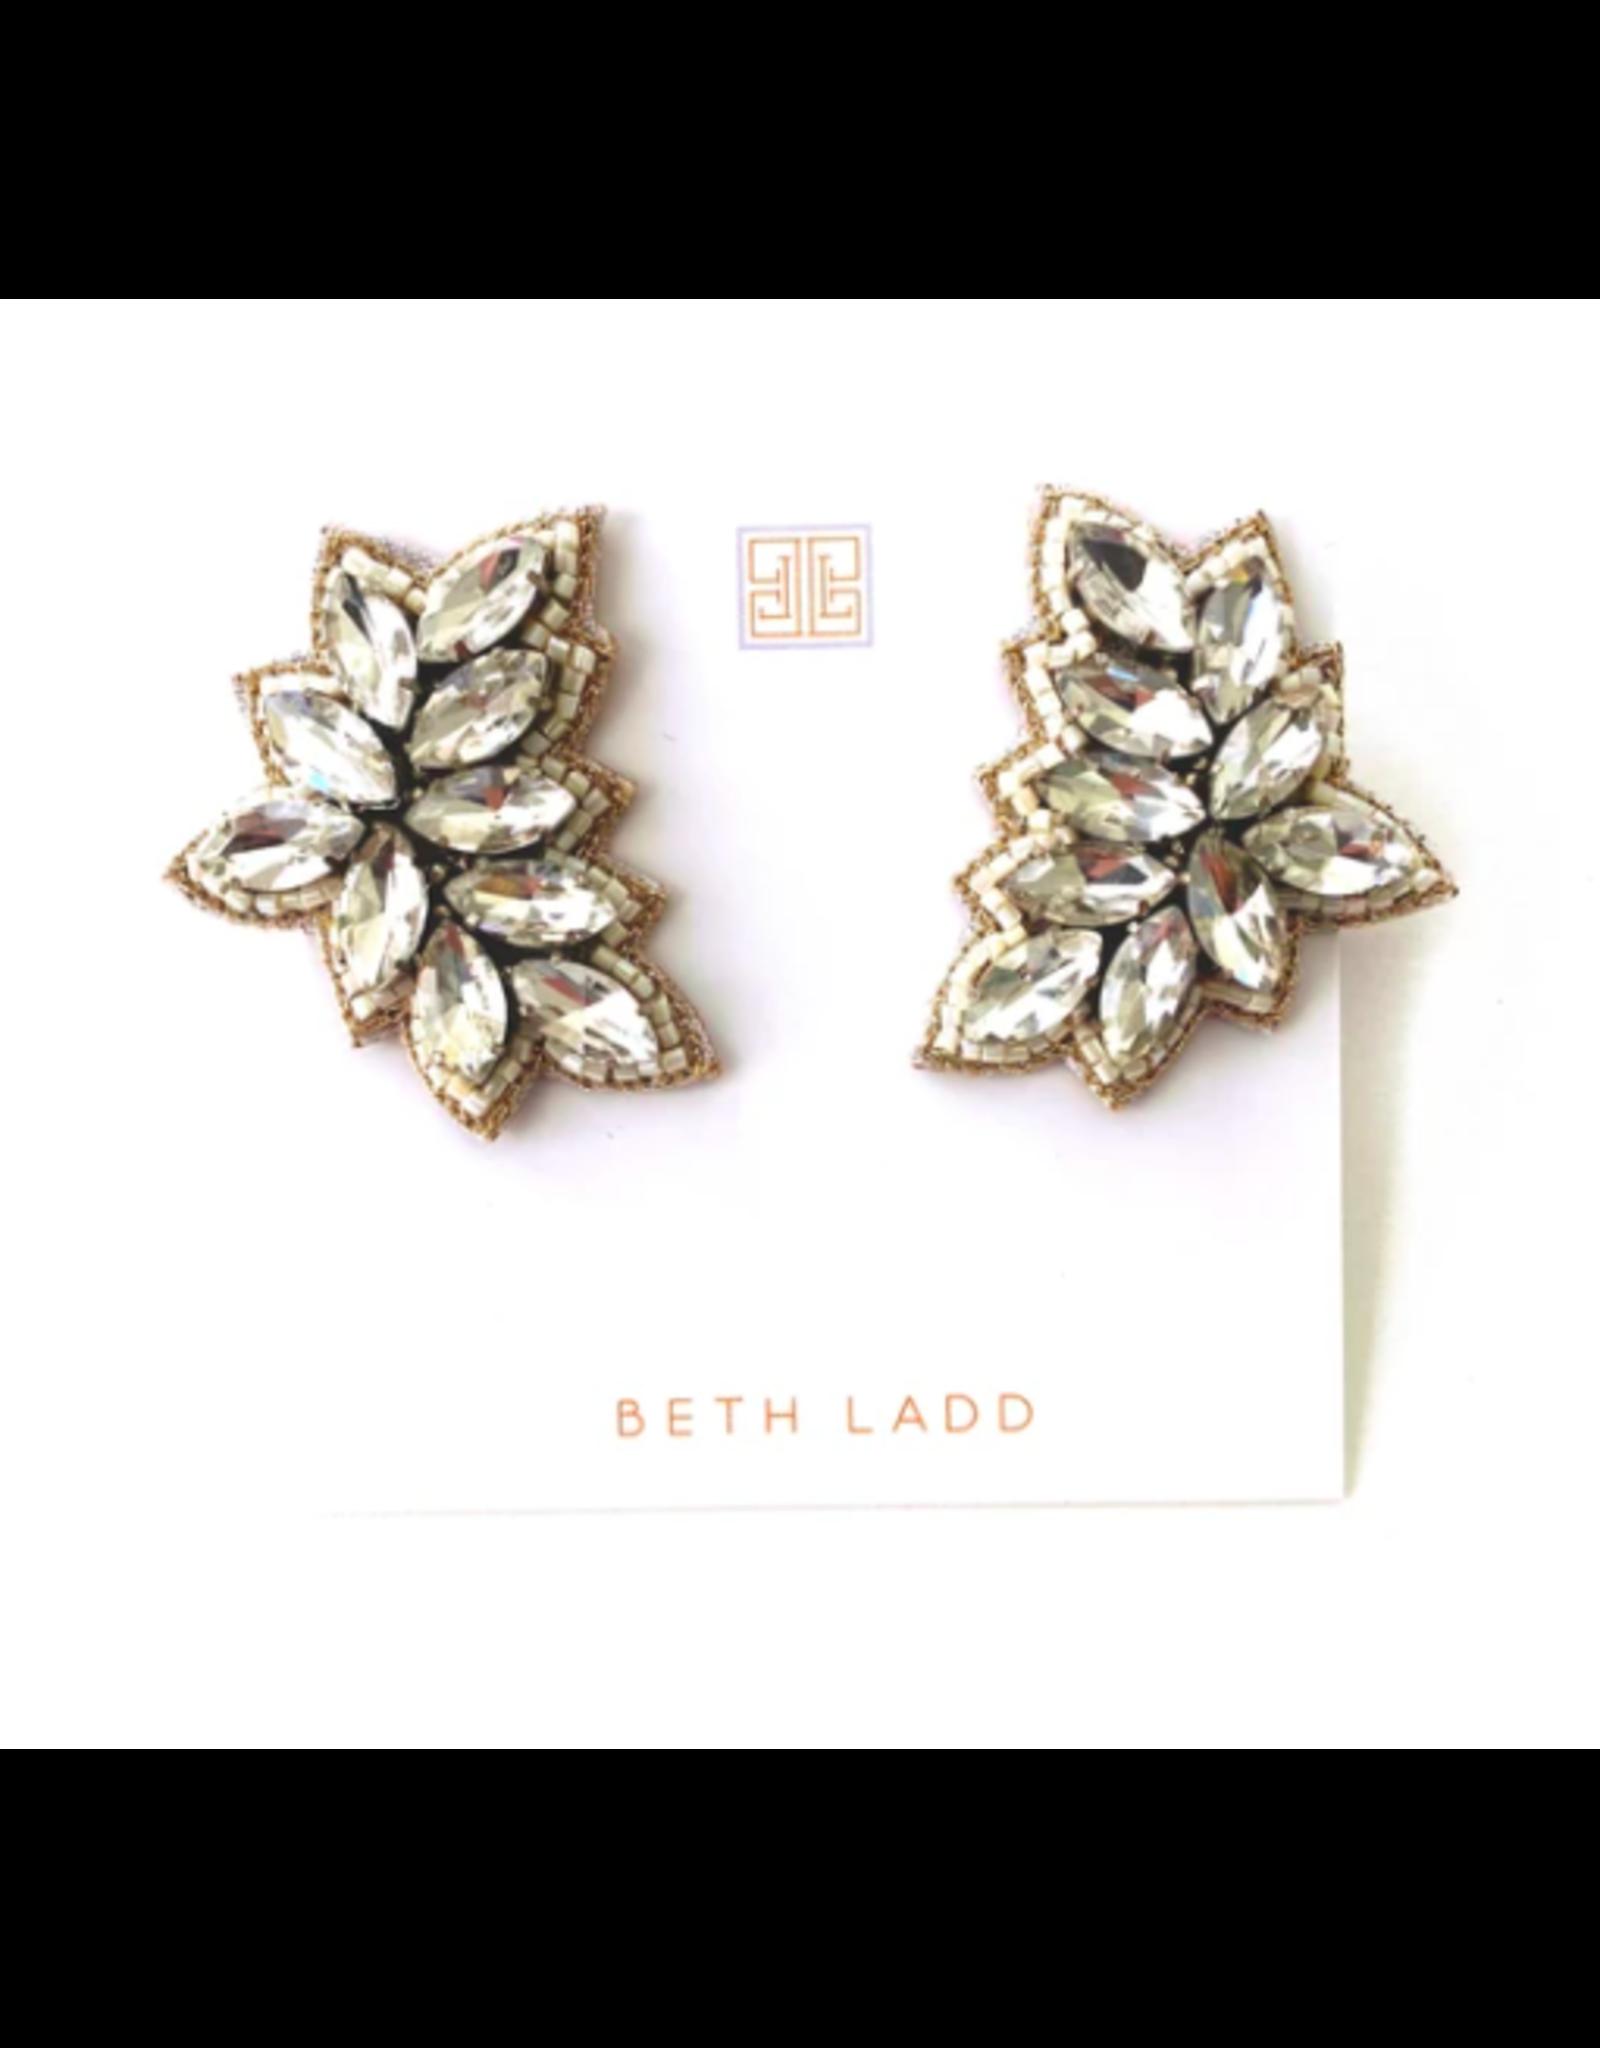 Beth Ladd Collection Crosby Stud in Silver by Beth Ladd